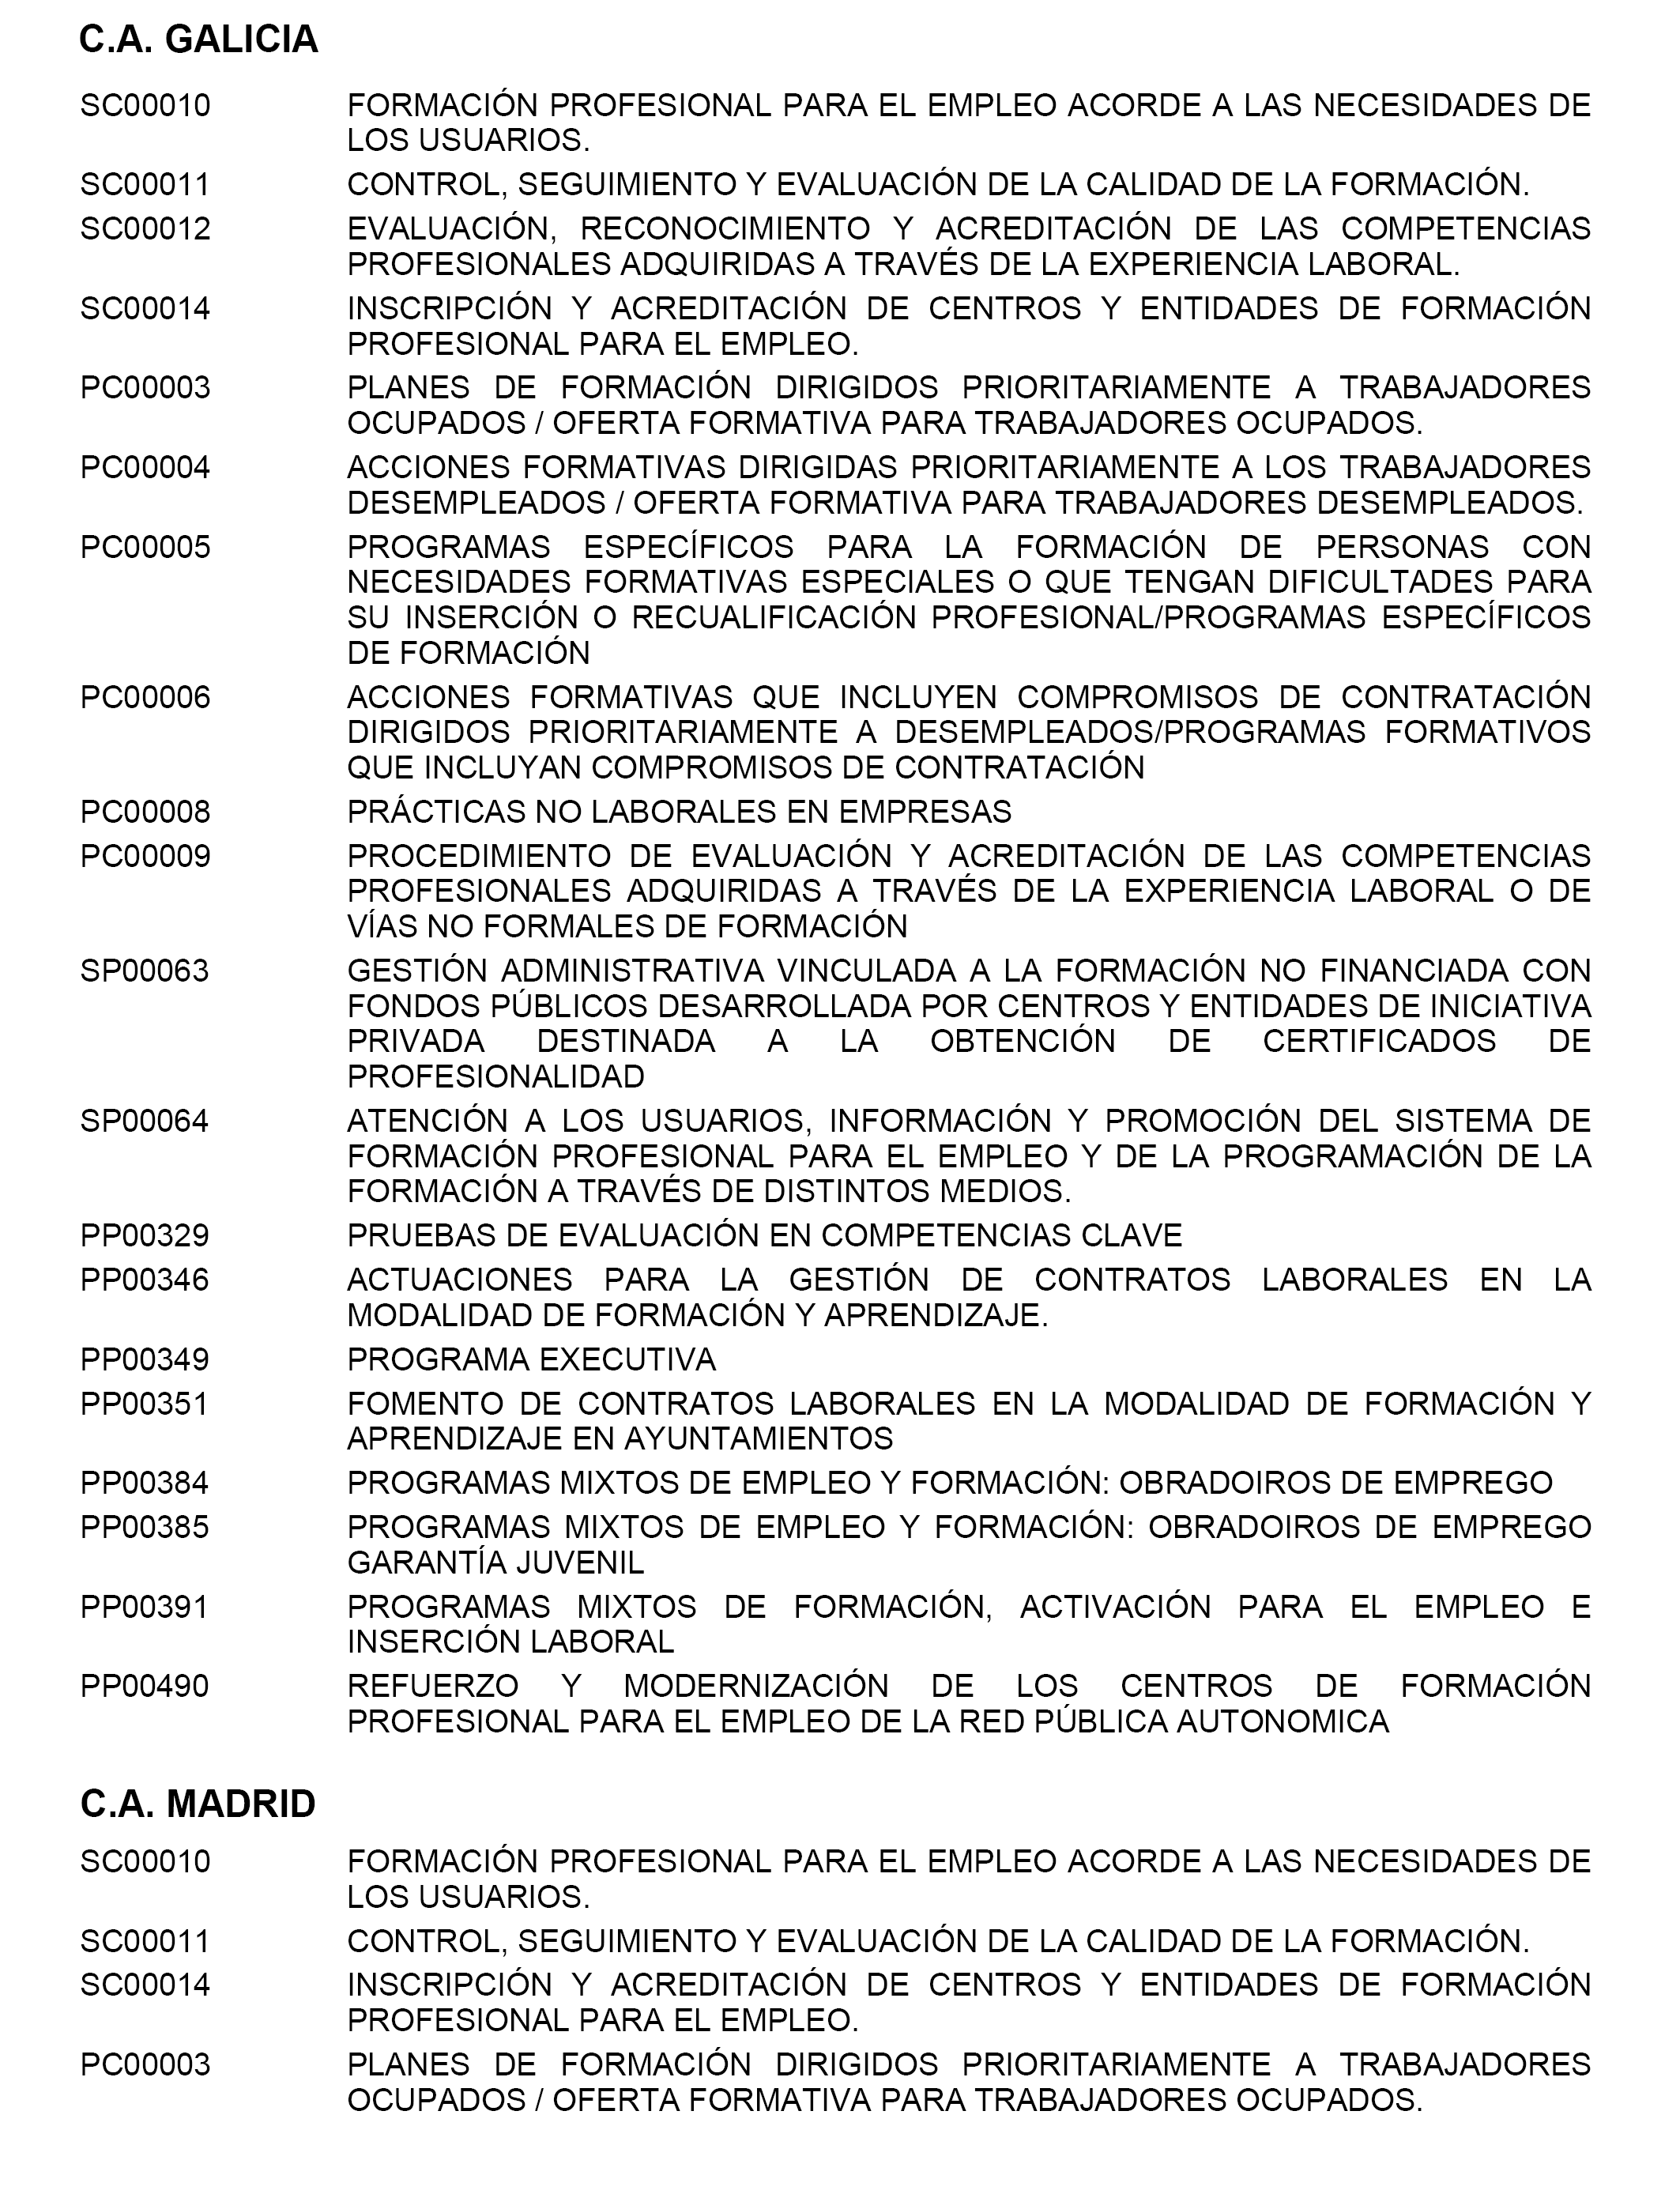 BOE.es - Documento BOE-A-2017-15460